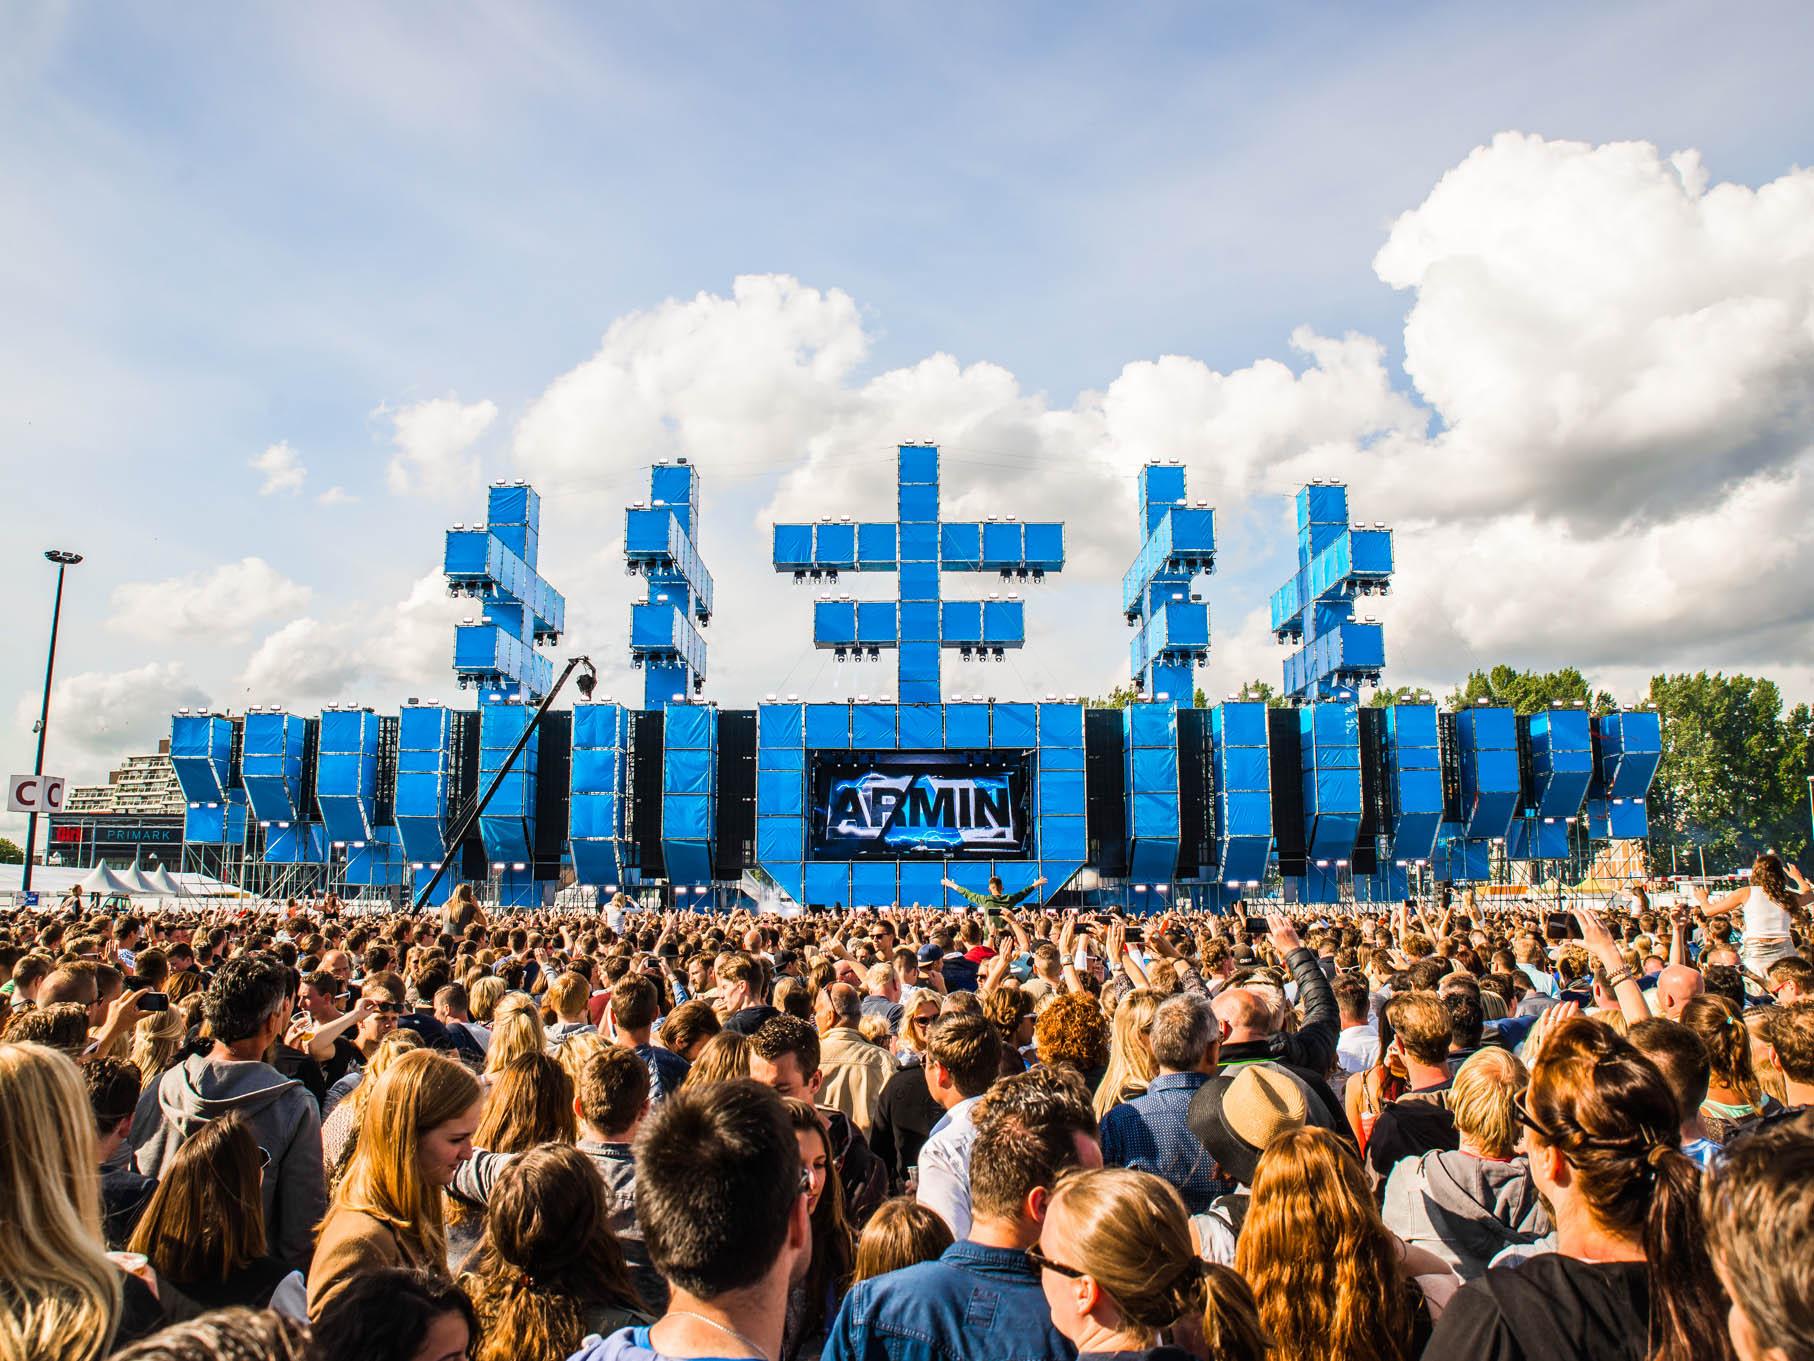 coreworks dance event rotterdam 2015